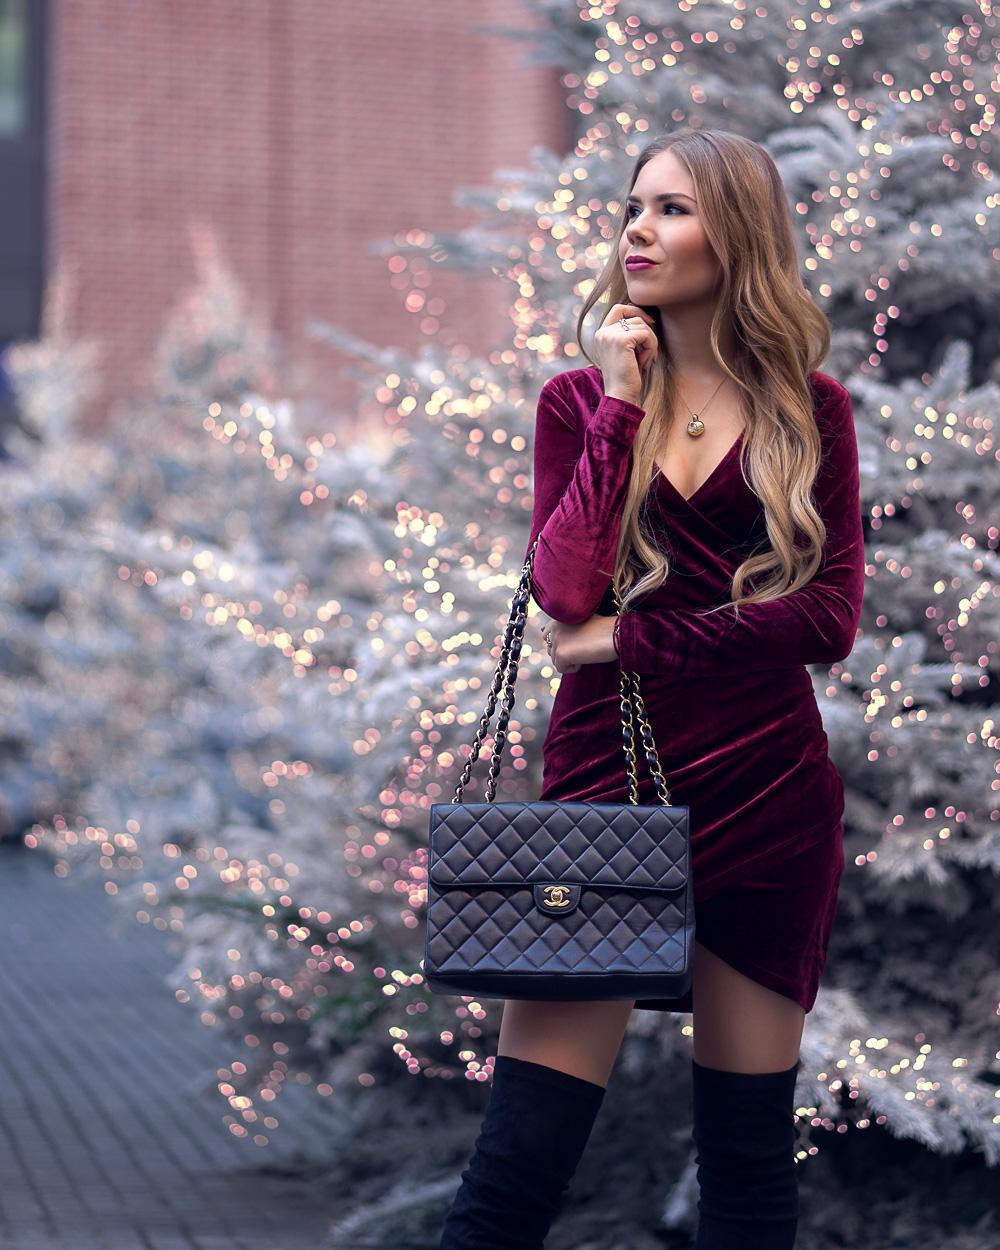 Figurbetontes Kleid aus rotem Samt-Designer Tasche-Chanel-schwarze Overknees